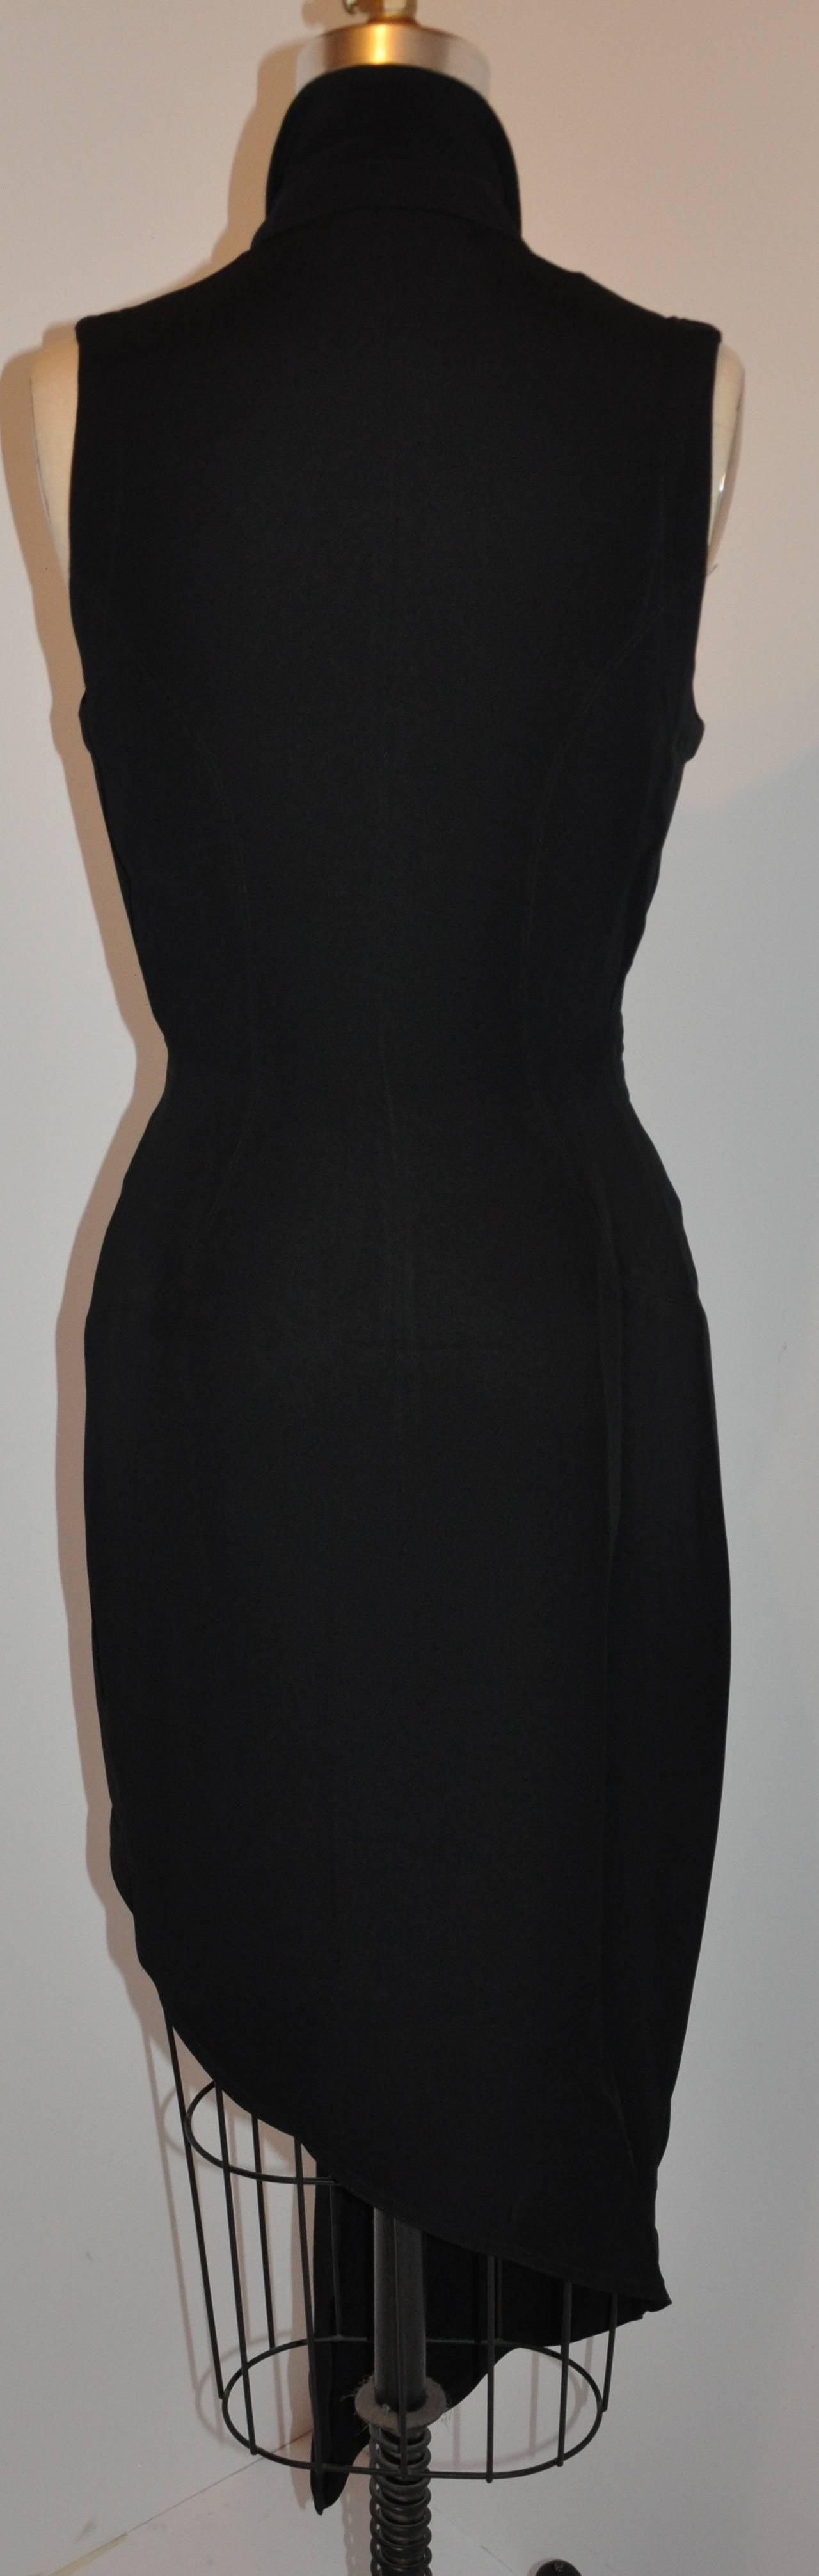 Ozbek Black Asymmetrical Double Breasted Sleeveless Dress 2